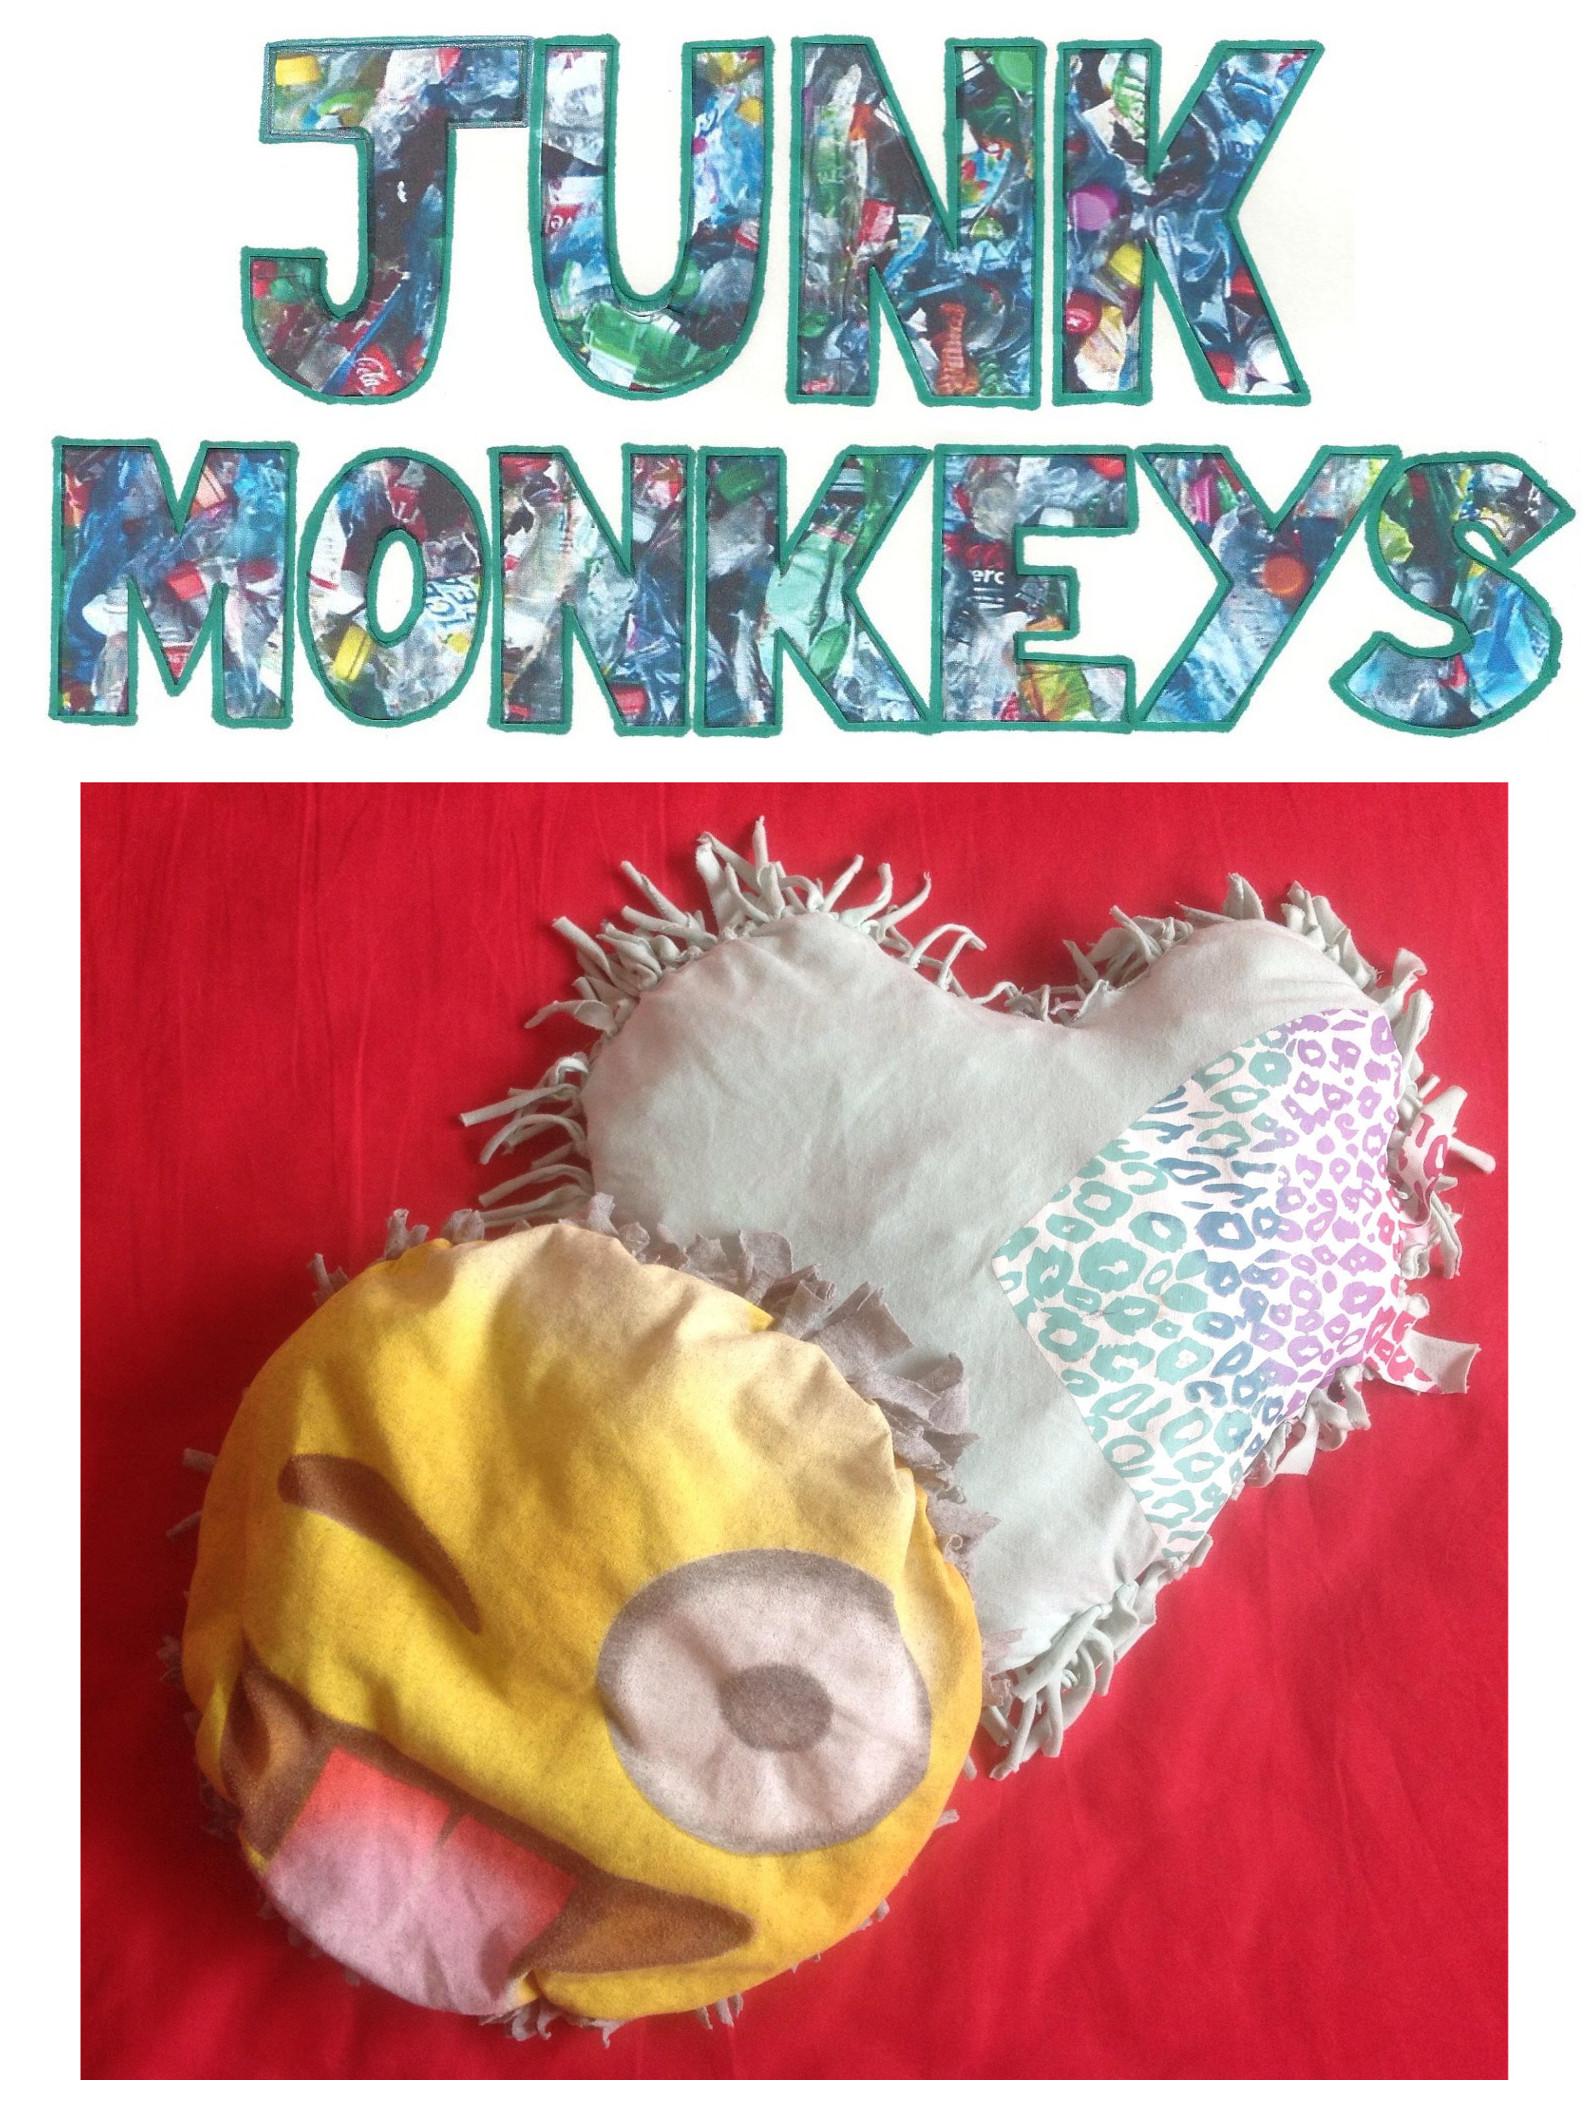 Junk Monkeys T shirt cushion